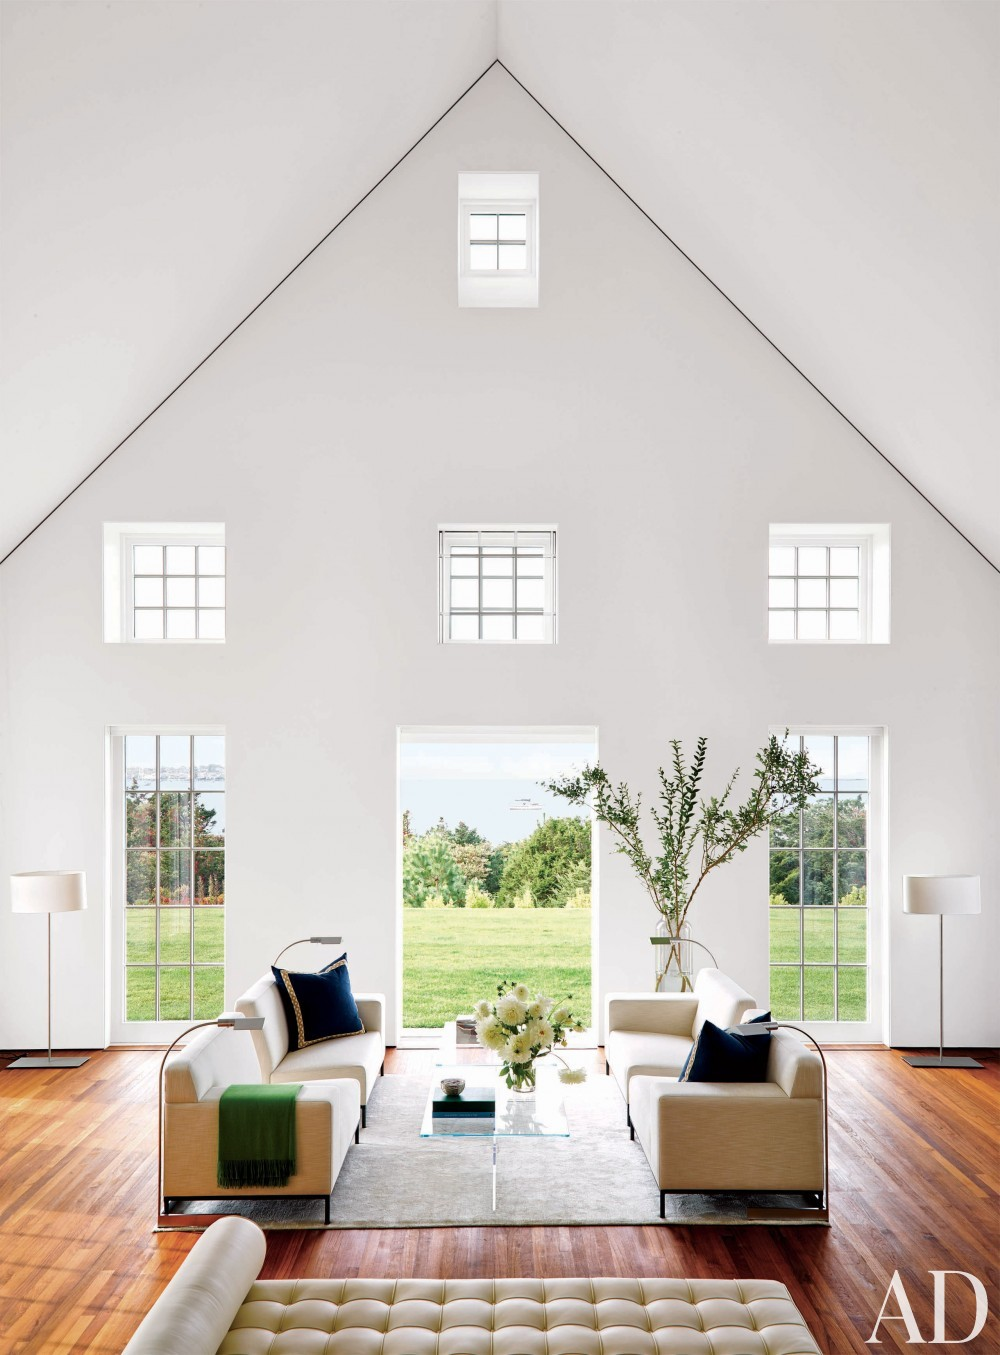 Modern Living Room by Simon Jacobsen and Jacobsen Architecture in Nantucket, Massachussetts